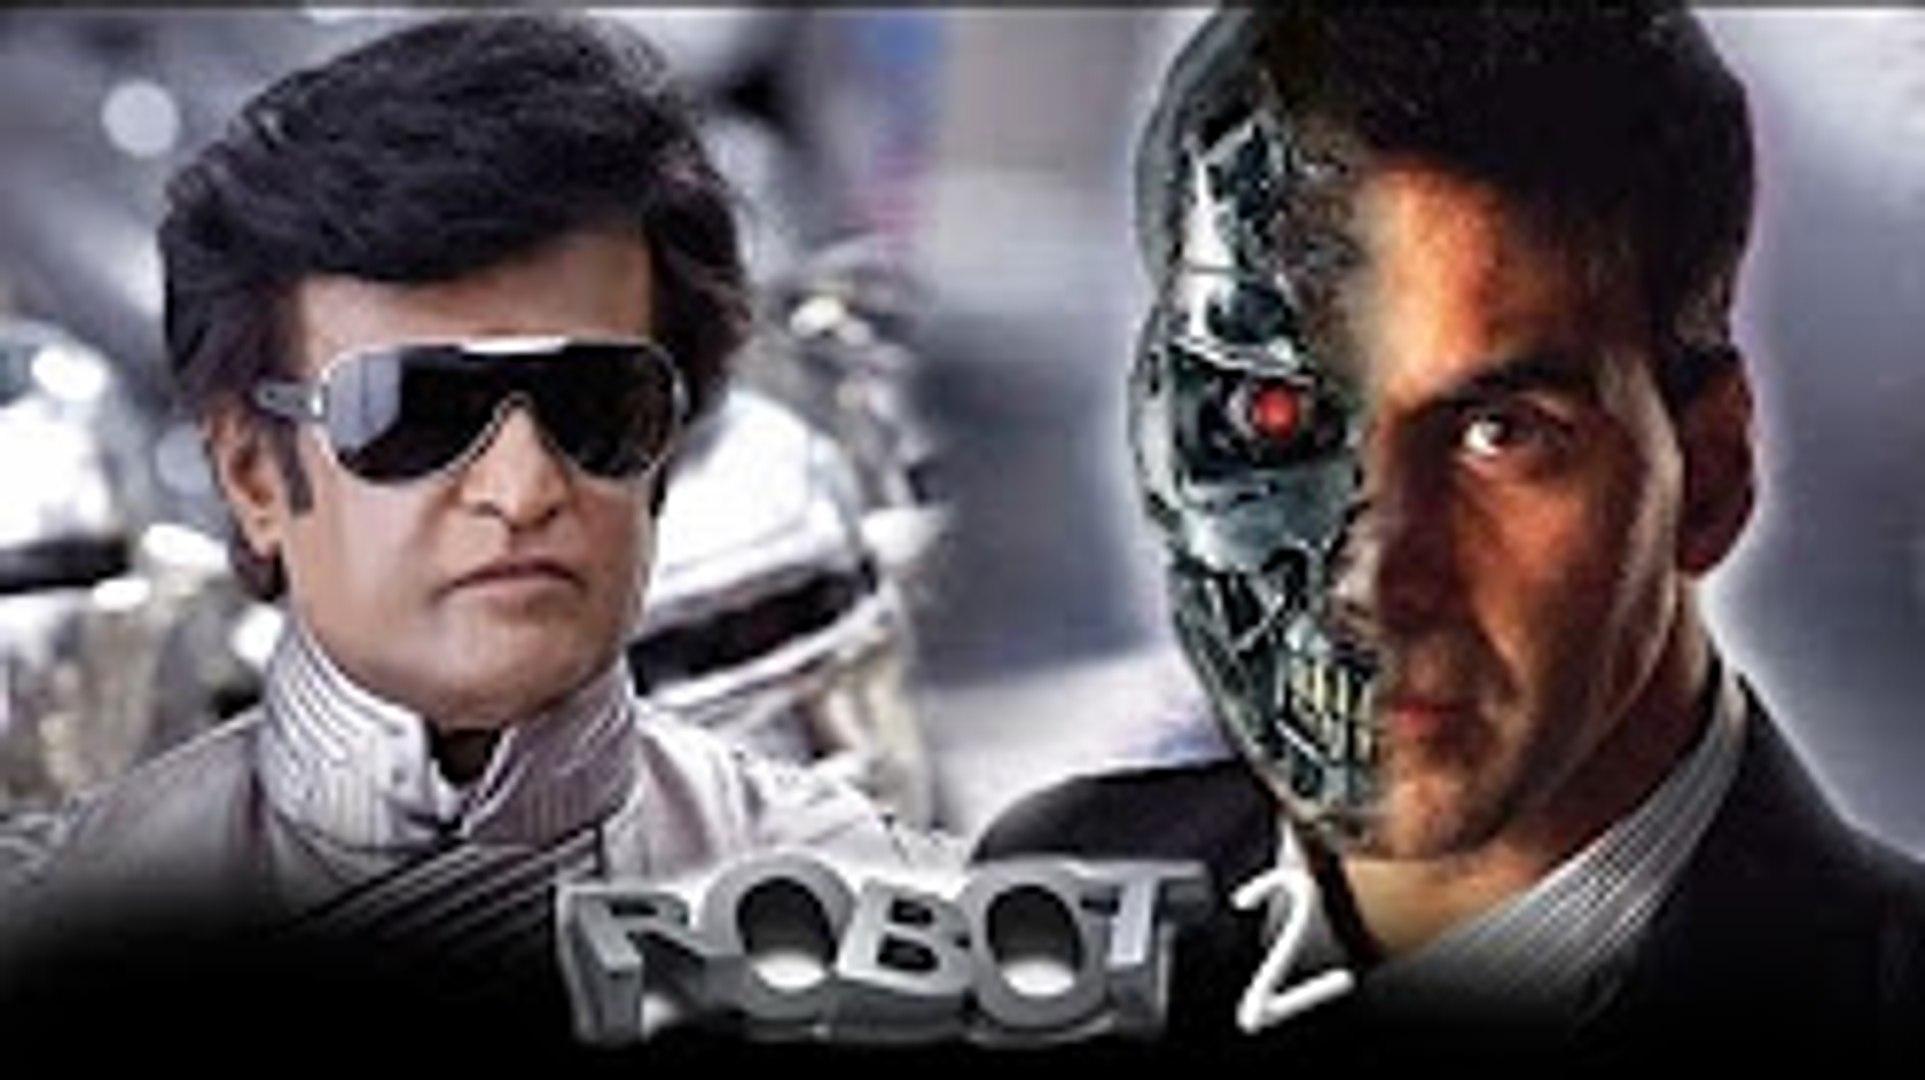 Robot 2 Trailer First Look - Rajnikanth New Movie Akshay Kumar - Indian New Movie Trailers